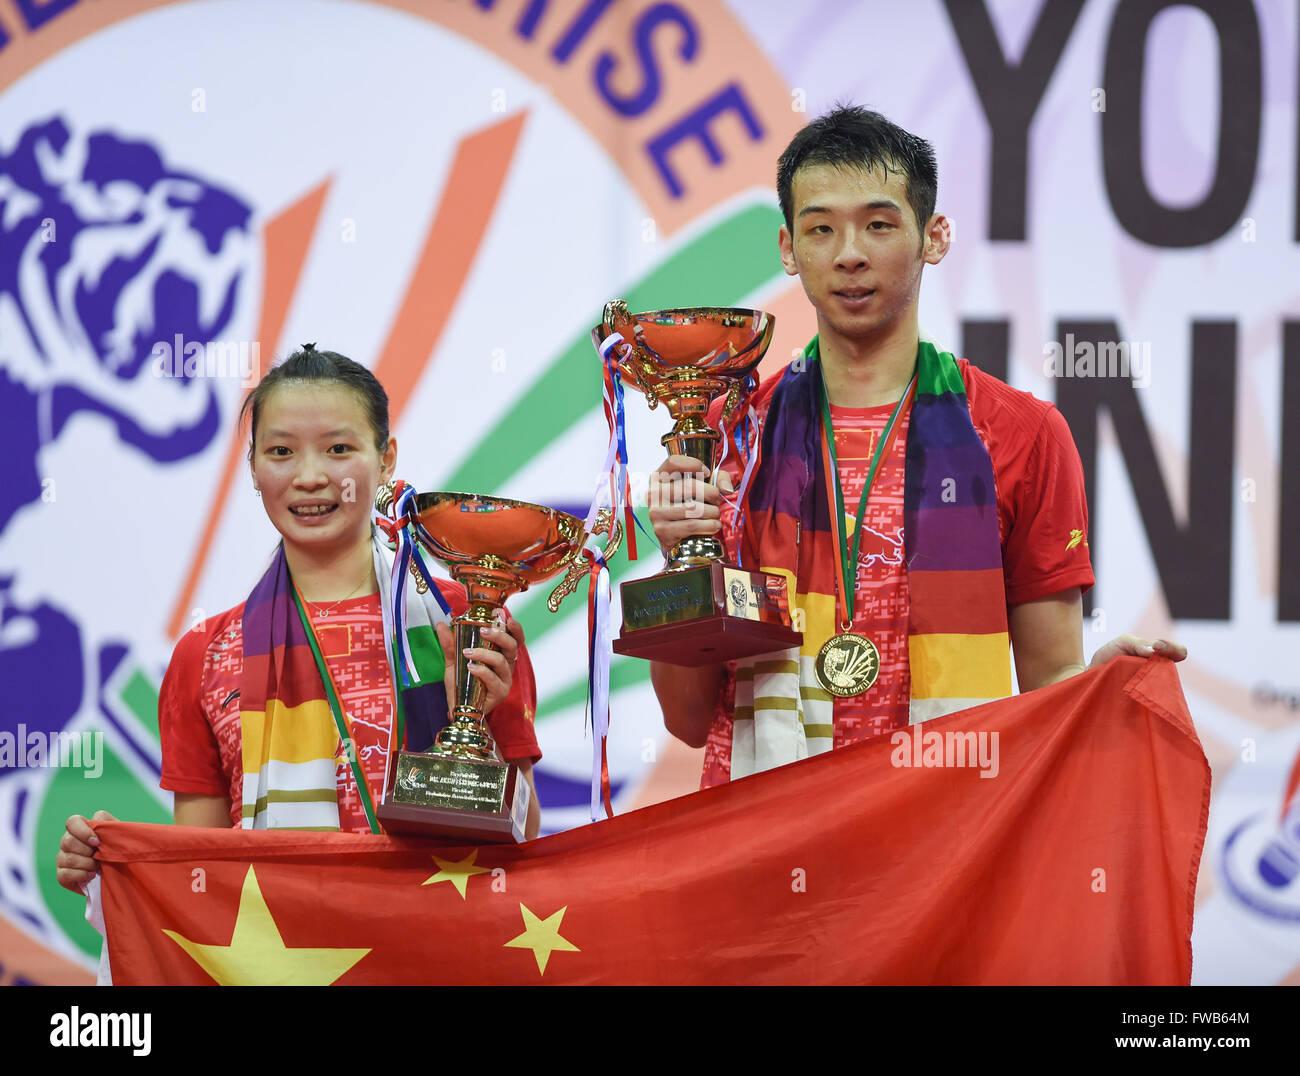 New Delhi India 3rd Apr 2016 Lu Kai R and Huang Yaqun of